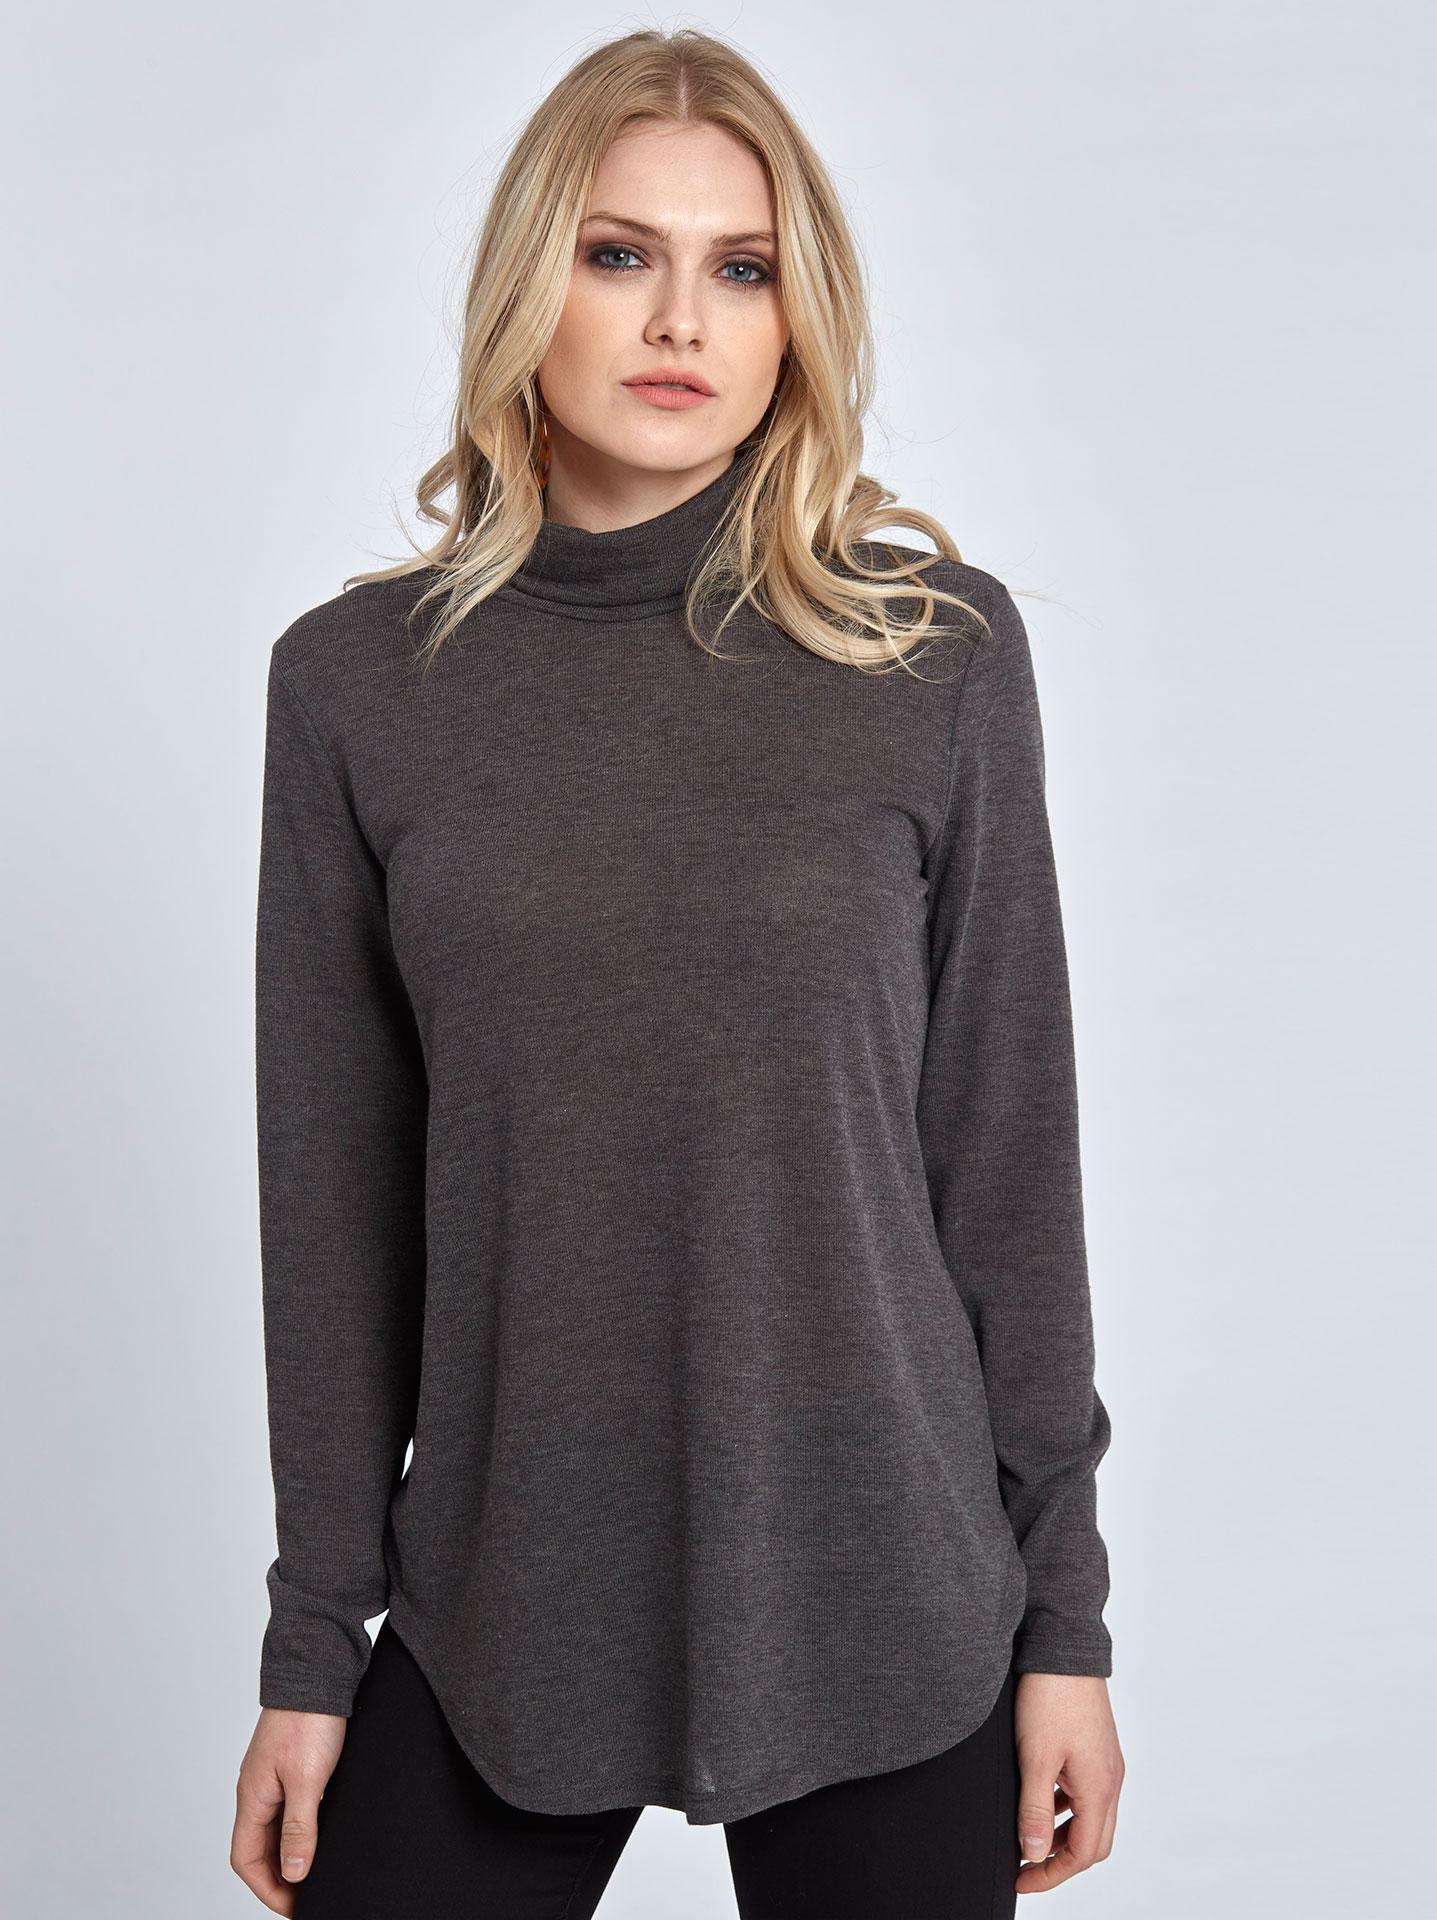 8be66809721d Γυναικεία Ρούχα Μπλούζες Πλεκτή ζιβάγκο μπλούζα WL4874.4001+1